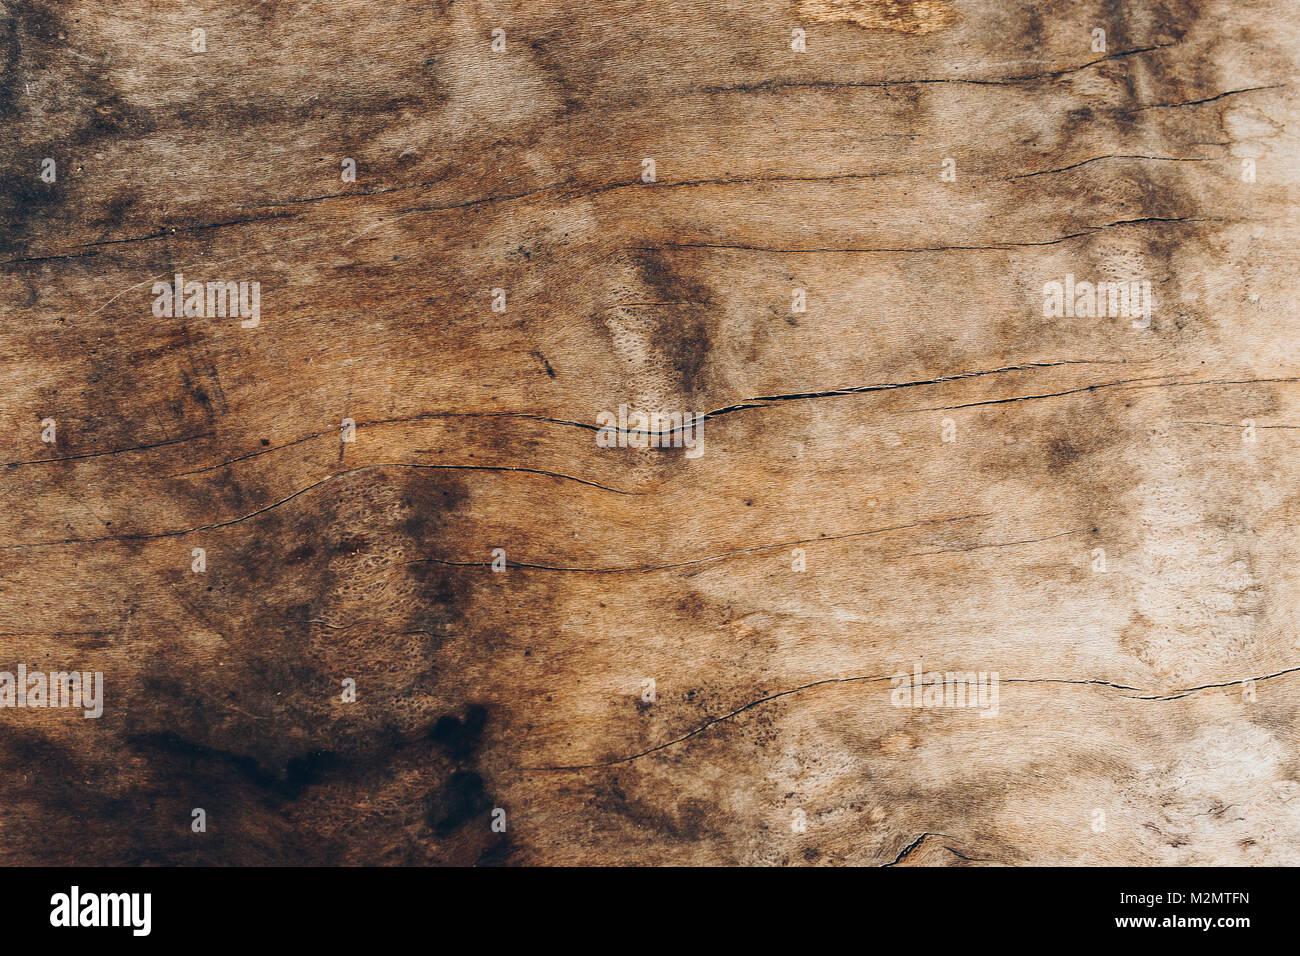 La trama de fondo de textura de madera vieja Foto de stock